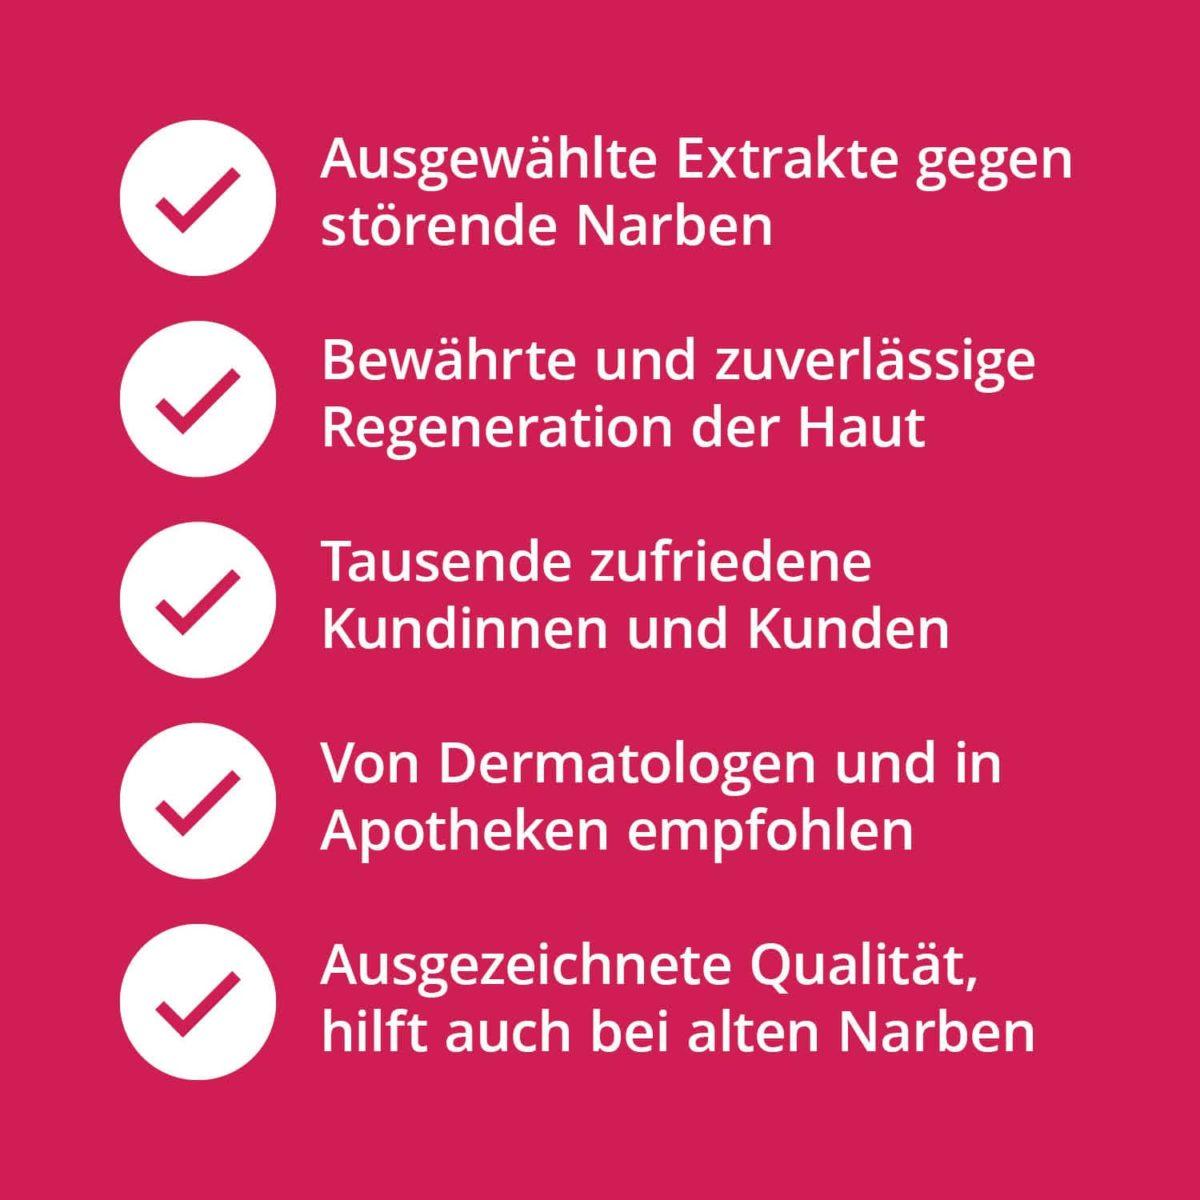 Casida Narbenpflegeöl Repair & Protect – 20 ml 10086758 PZN Apotheke Akne alte Aknenarben behandeln Gesicht Körper pflanzlich (1)7